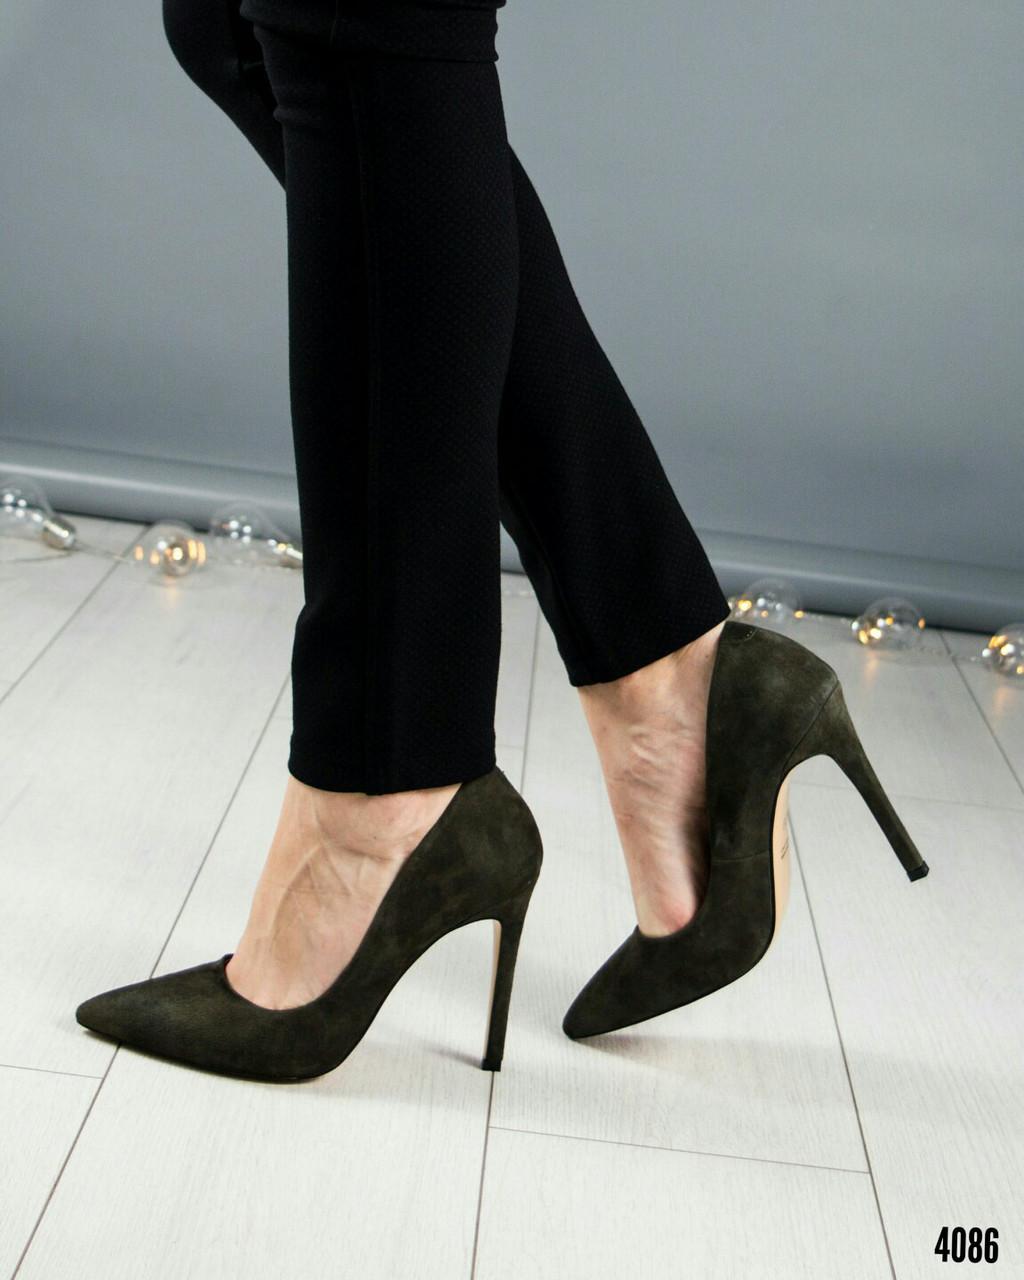 5f78e8d91 Замшевые туфли-лодочки Размер 38 39 - Интернет-магазин обуви TINA LUX в  Днепропетровской